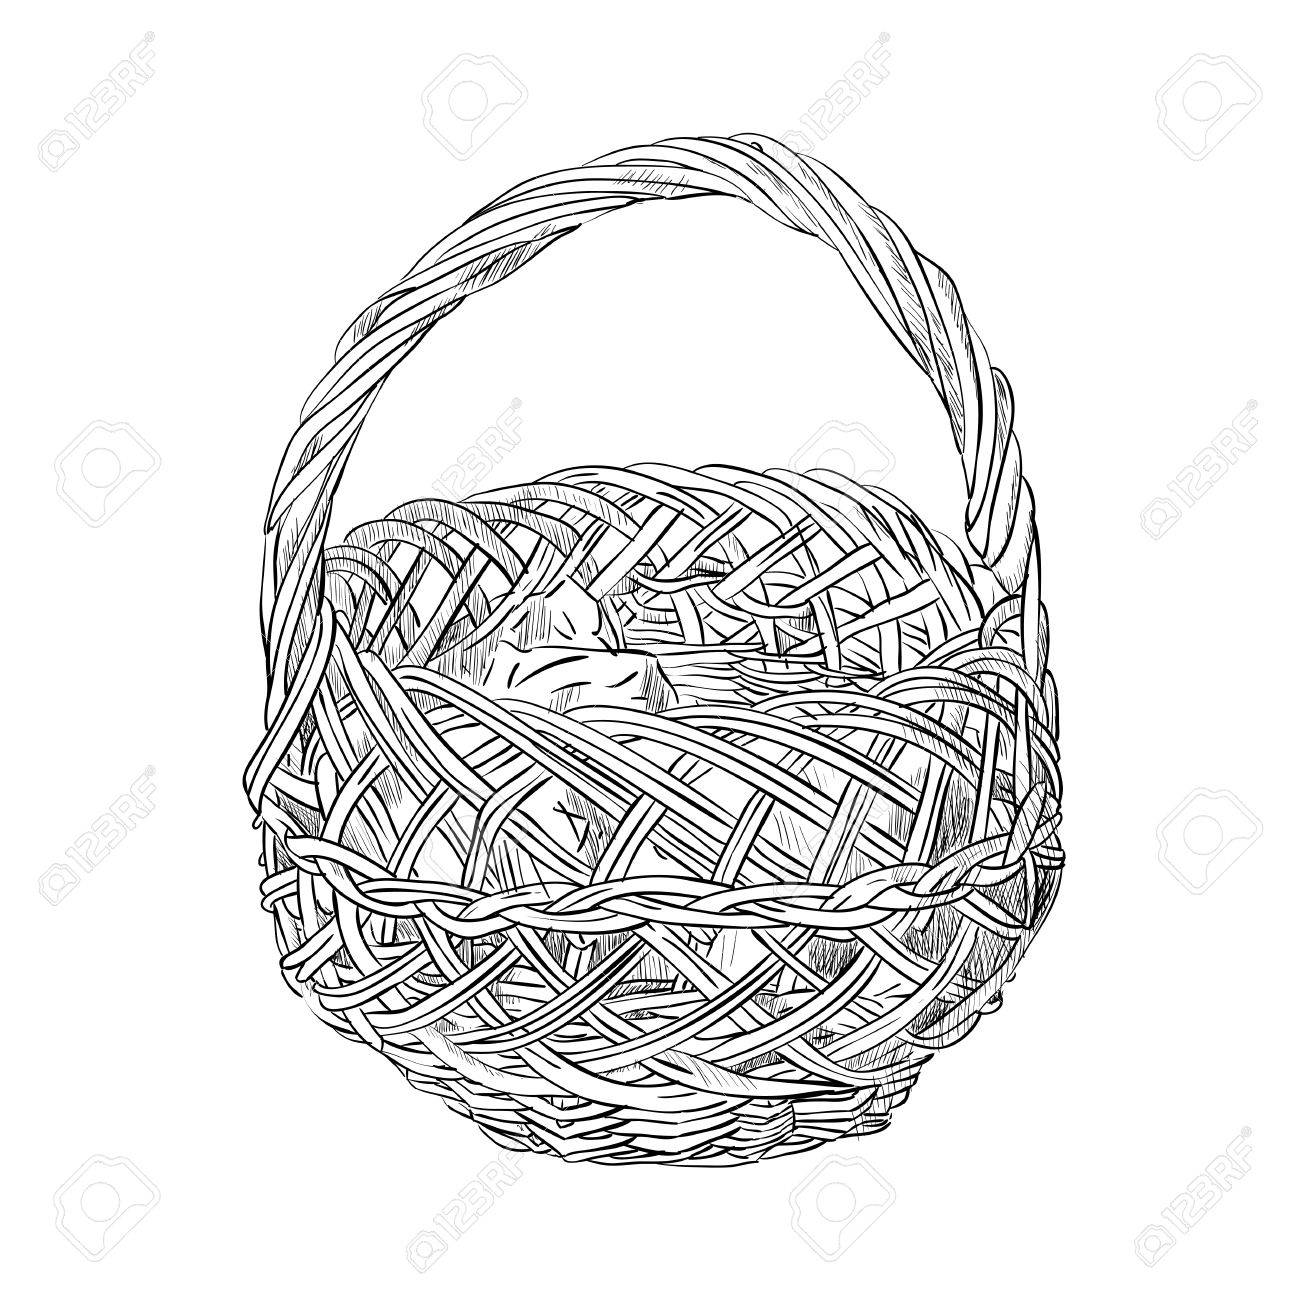 1300x1300 Vector Sketch Of Wicker Basket. Hand Draw Illustration. Royalty